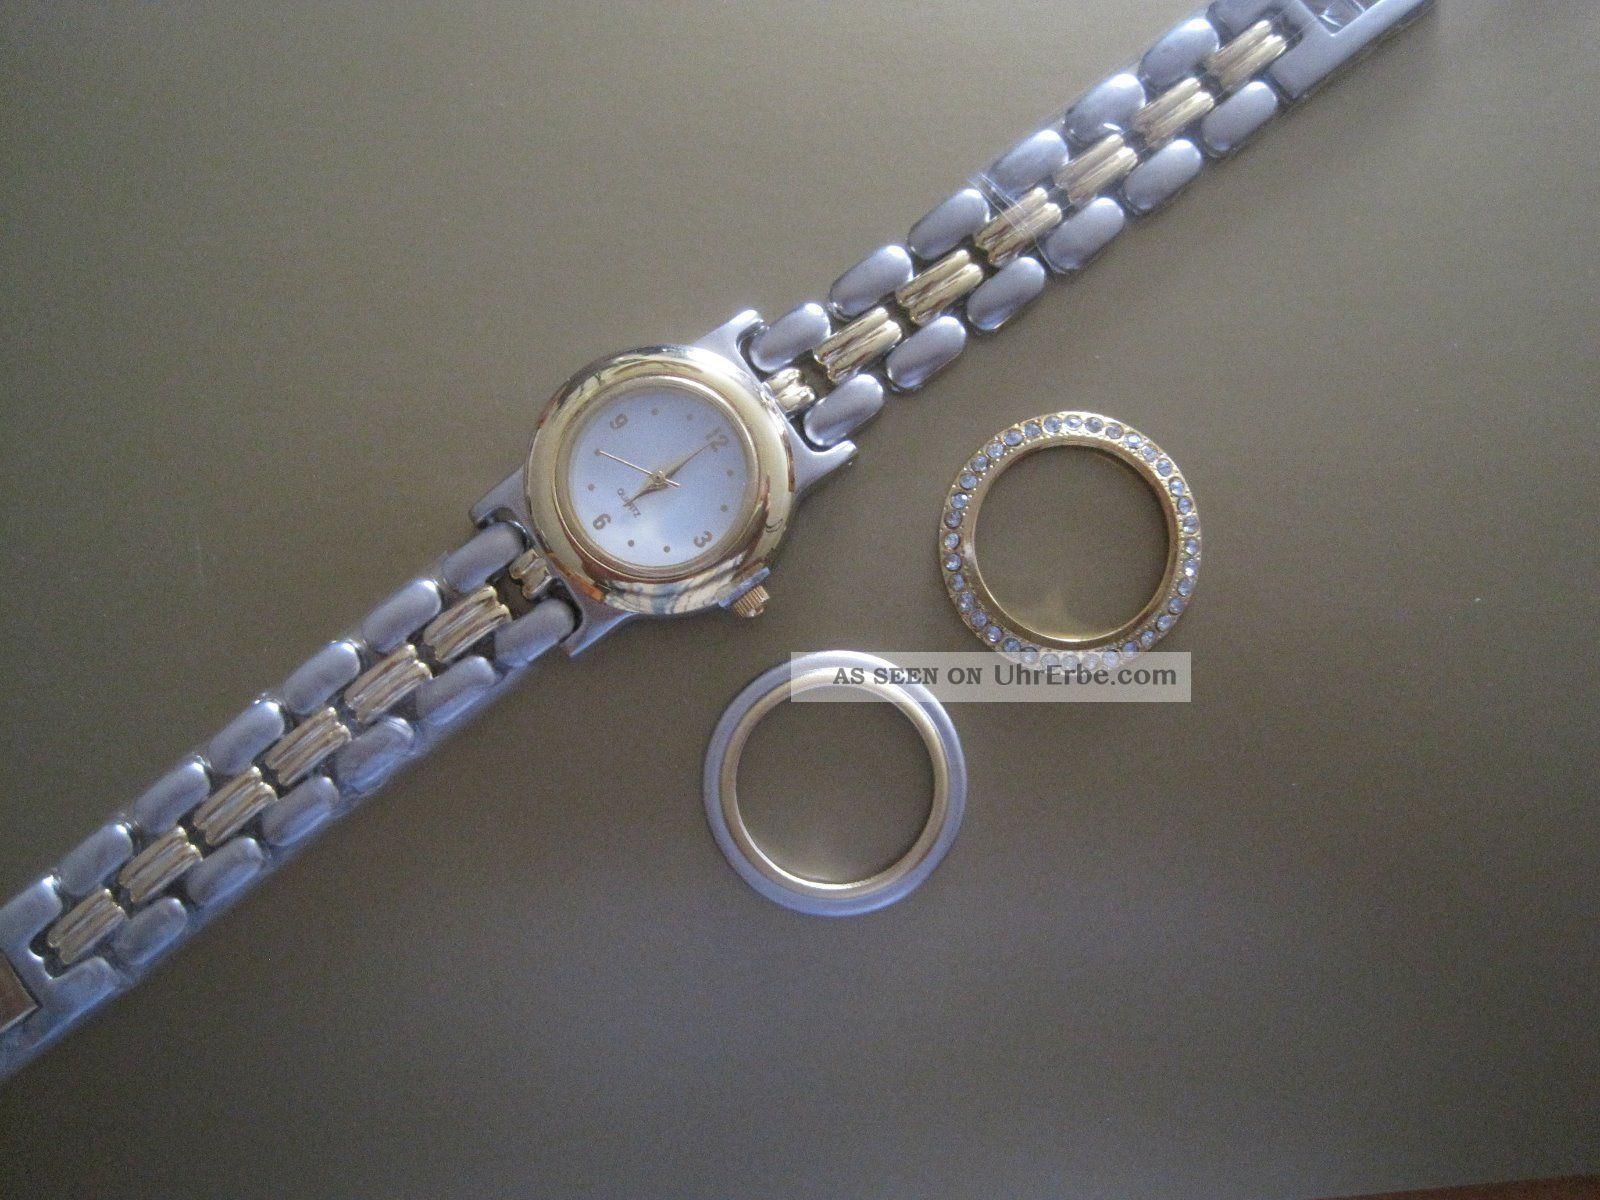 Schicke Da.  - Quarzuhr,  Metall,  3 In 1,  Gliederarmband 19cm, Armbanduhren Bild